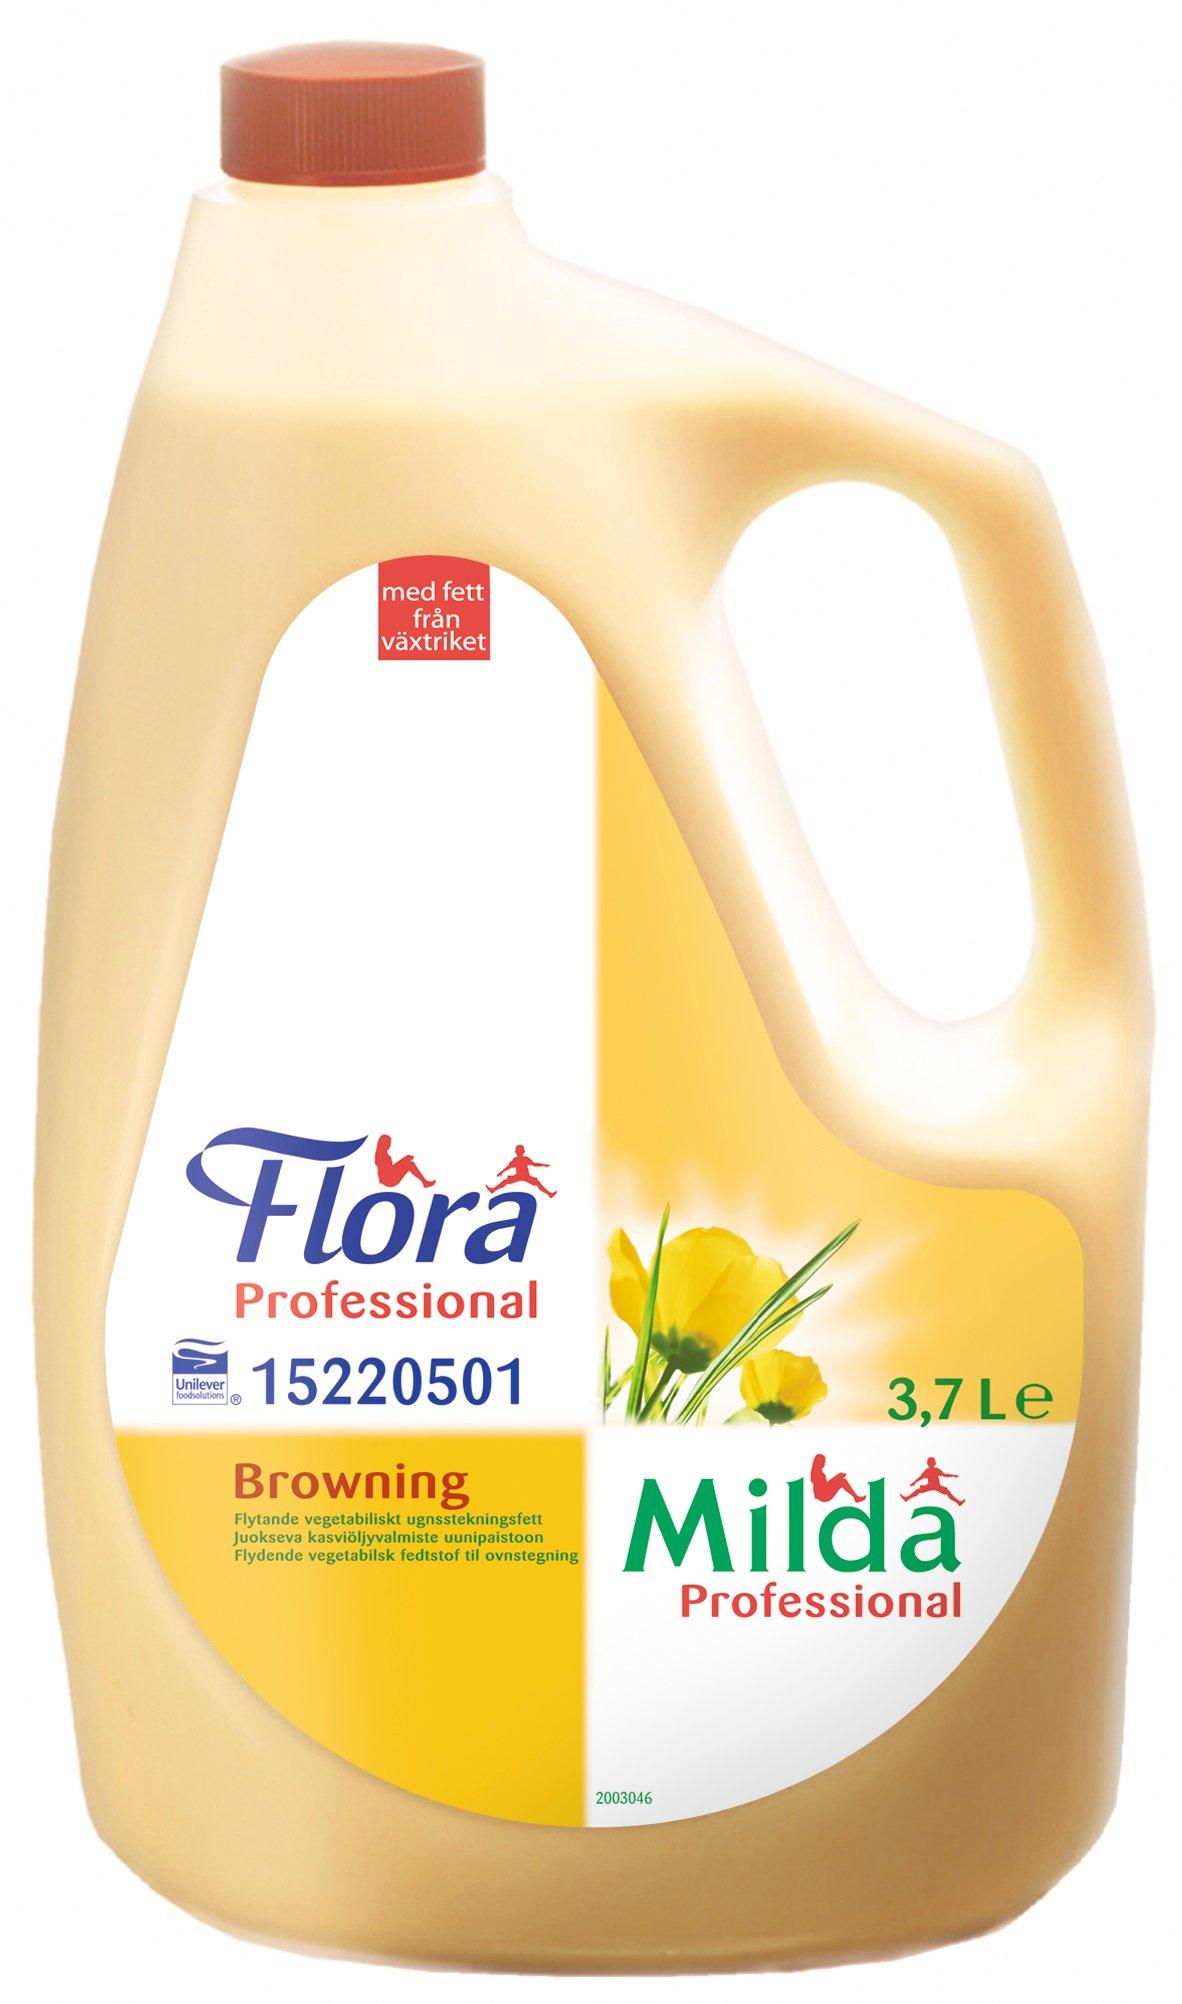 Milda Browning 3,7 l